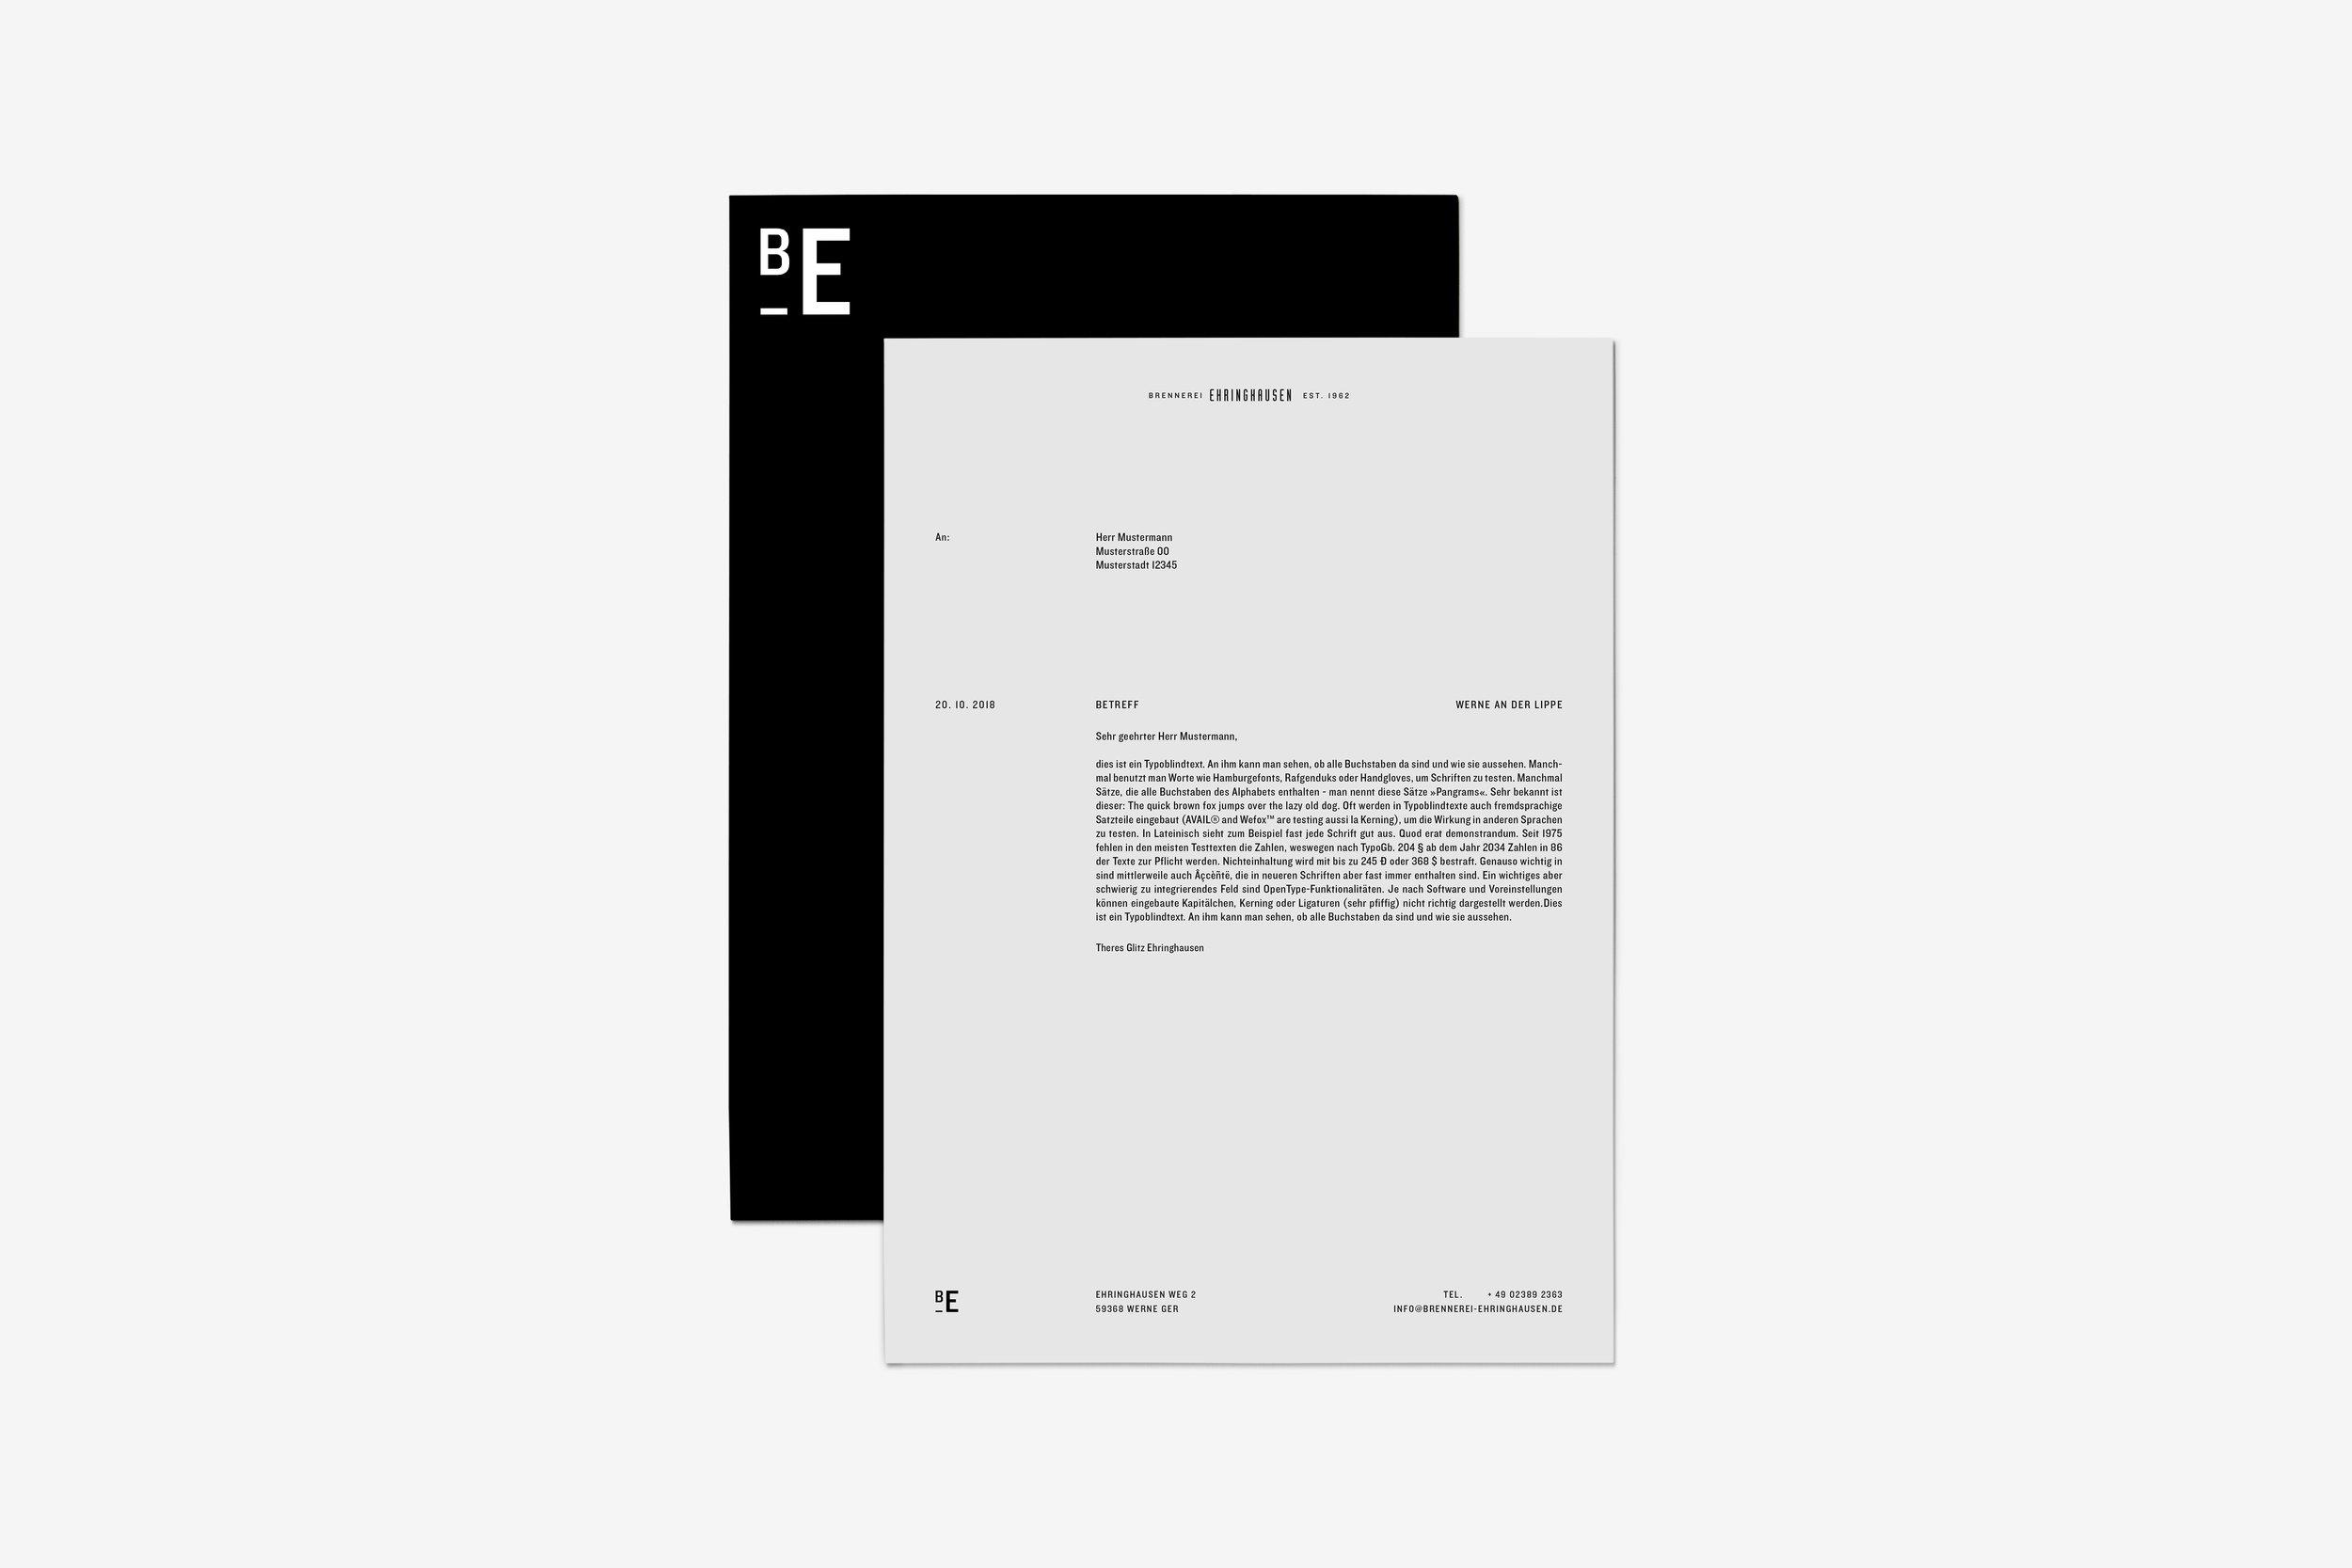 ffine_Brinkmann-Sonnenberg_Brennerei-Ehringhausen_corporate-design-8.jpg